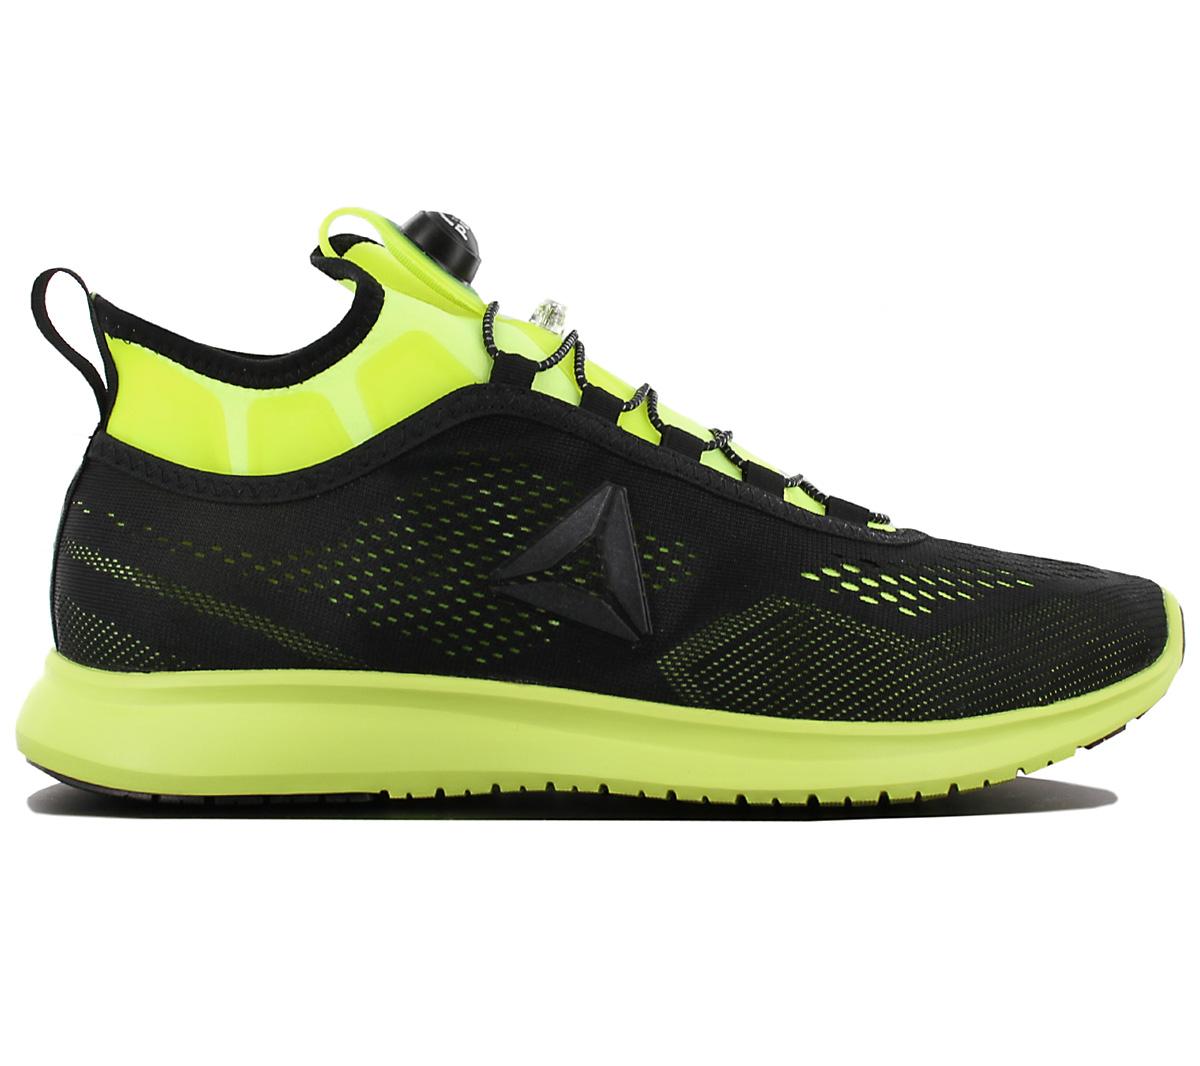 8c137f17cc6e8b Reebok Pump plus Tech Men s Shoes Sneakers Running Sports Shoes ...